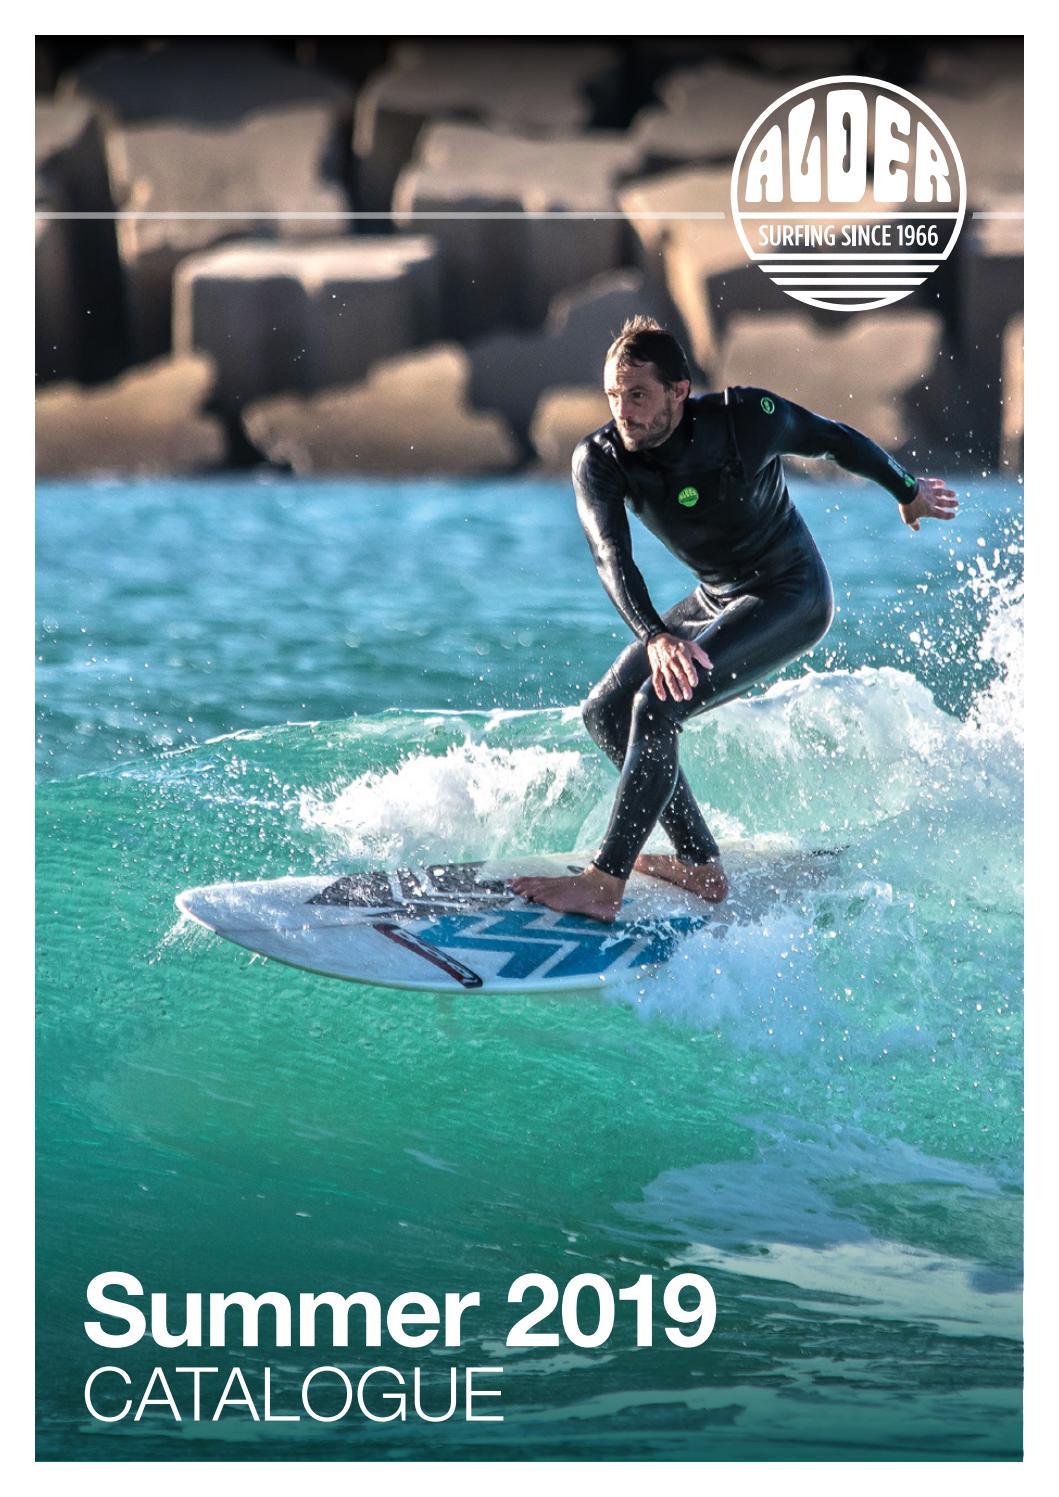 Watersports Wetsuit Alder Drift 5mm Round Toe Boot SUP Surf Kayak